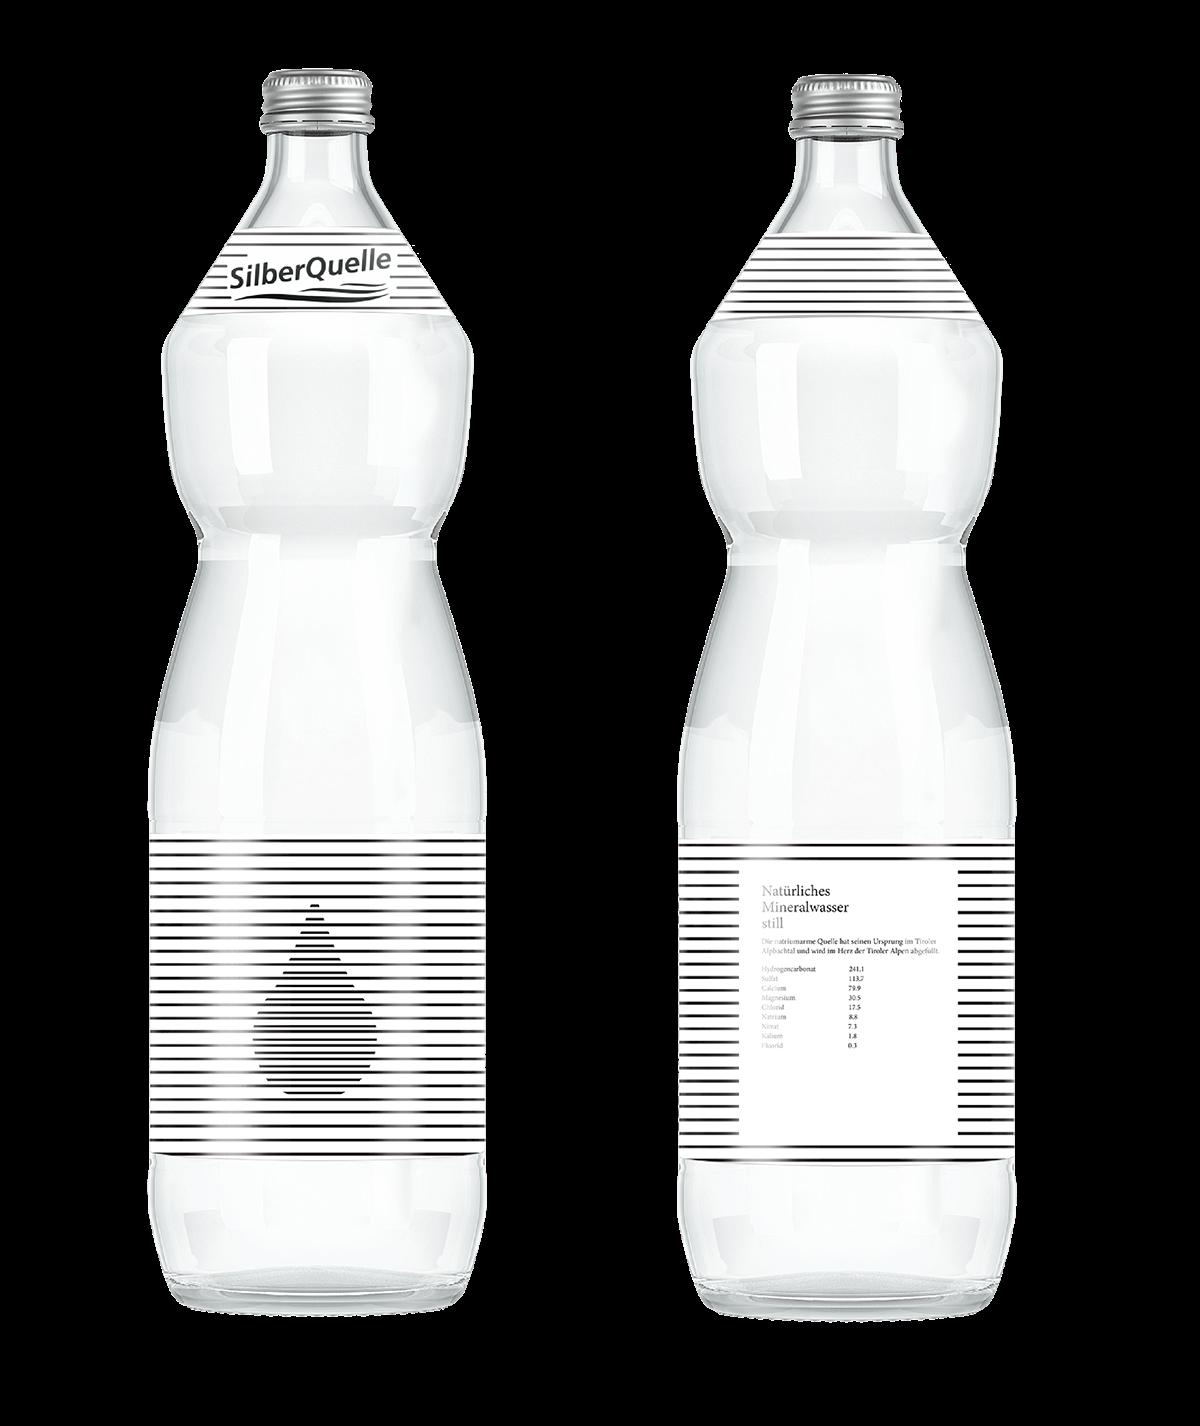 Silber Quelle Water Packaging Design On Behance